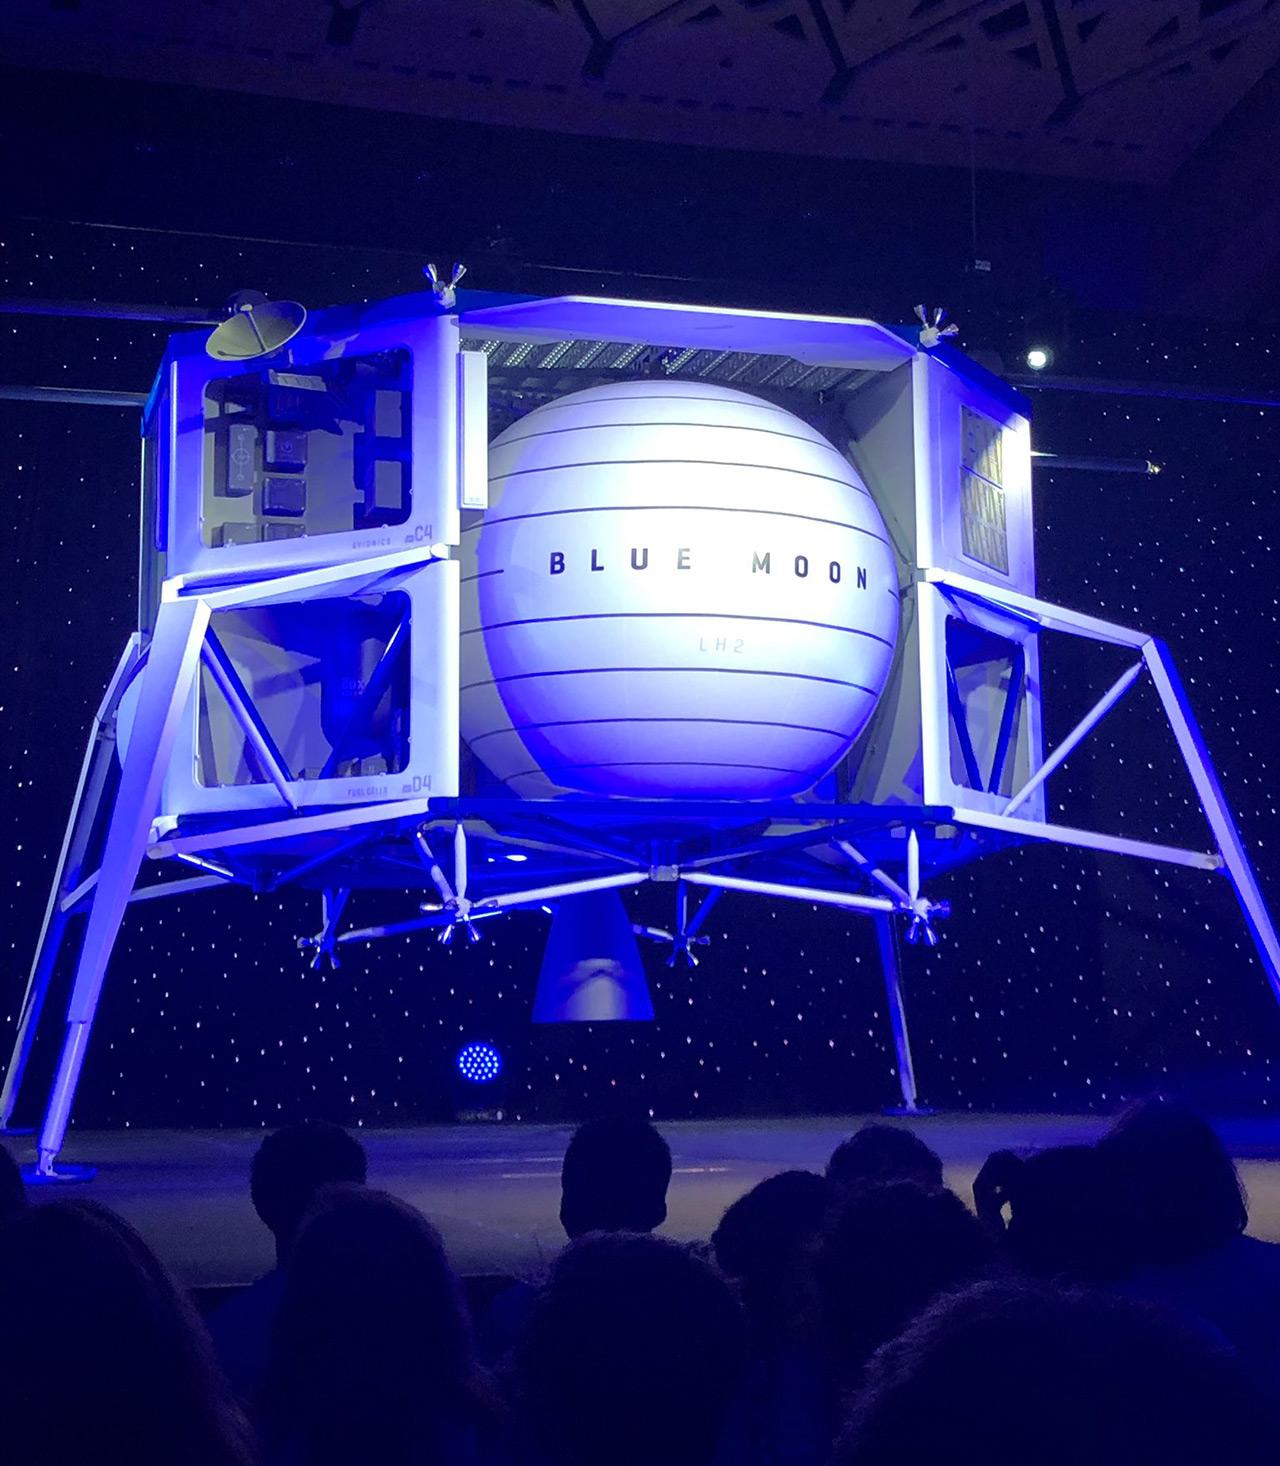 Jeff Bezos Blue Moon Landing